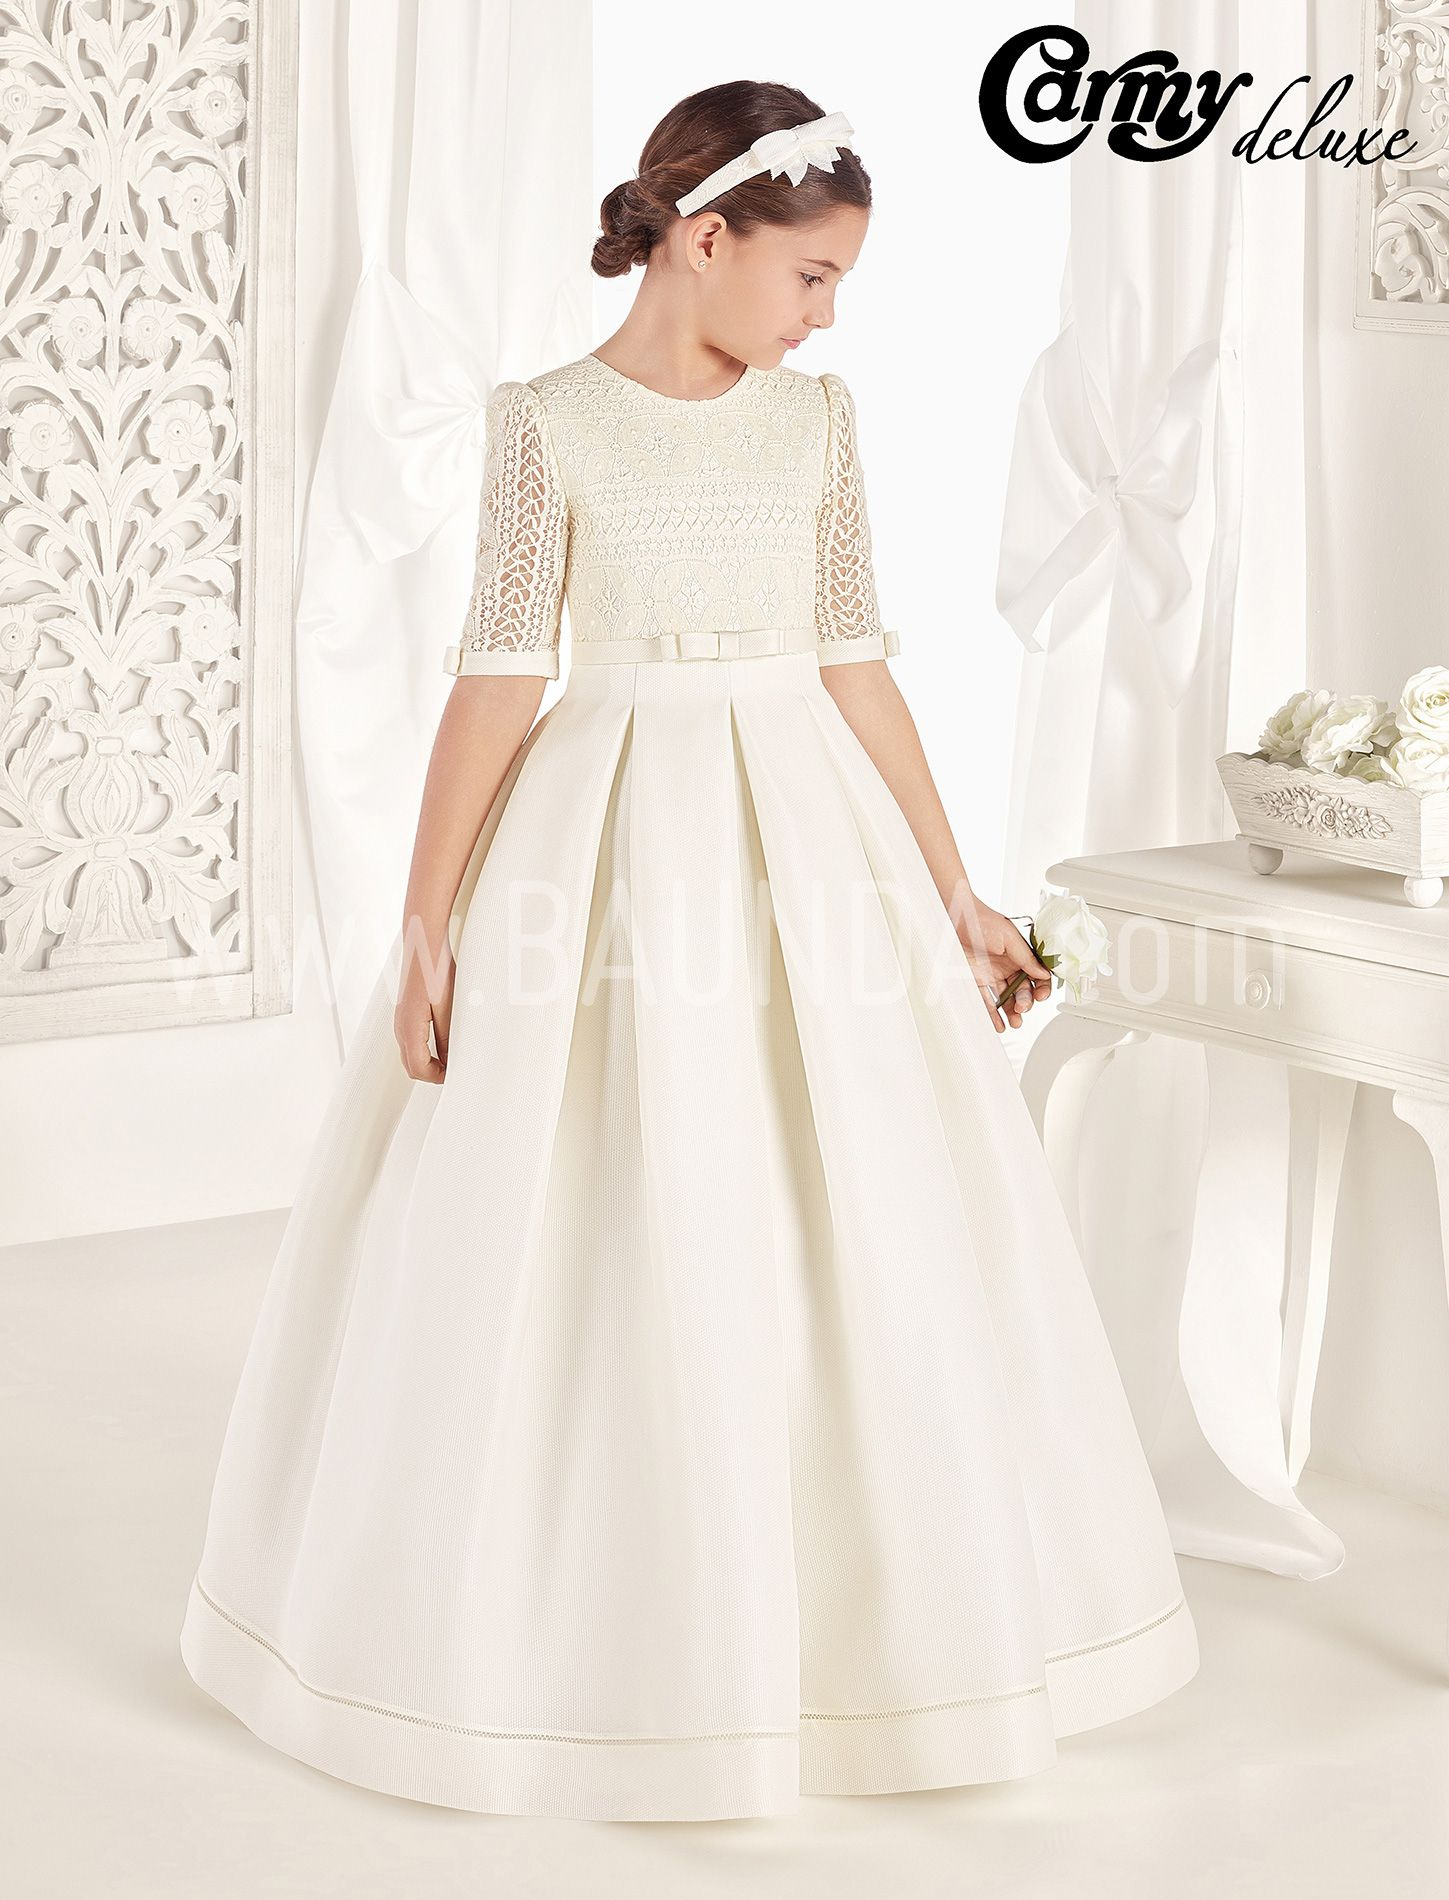 Busco vestidos de primera comunion